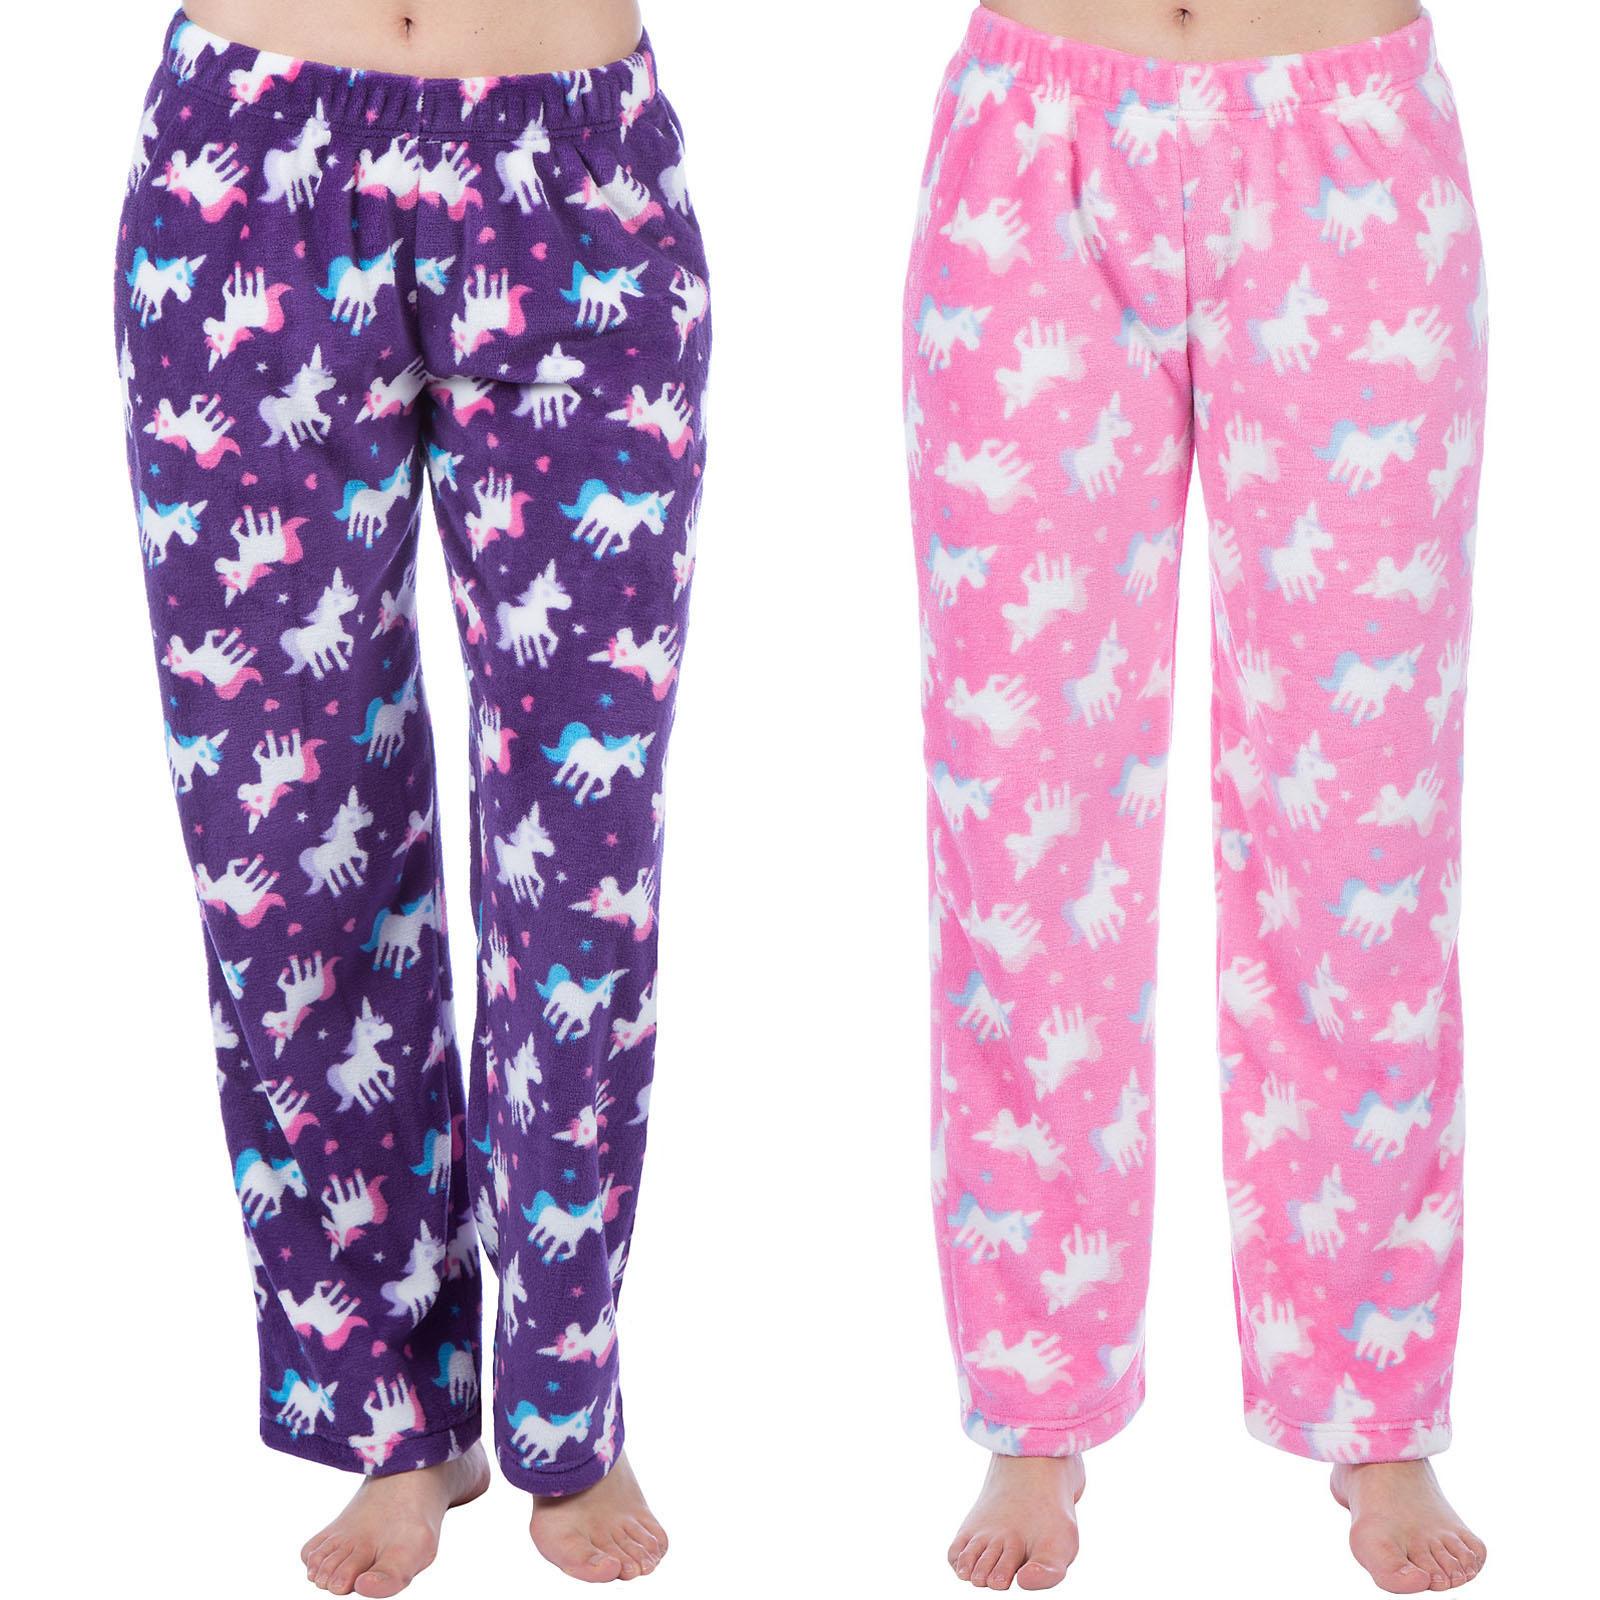 Selena Girl Kids Unicorn Pyjama Bottoms